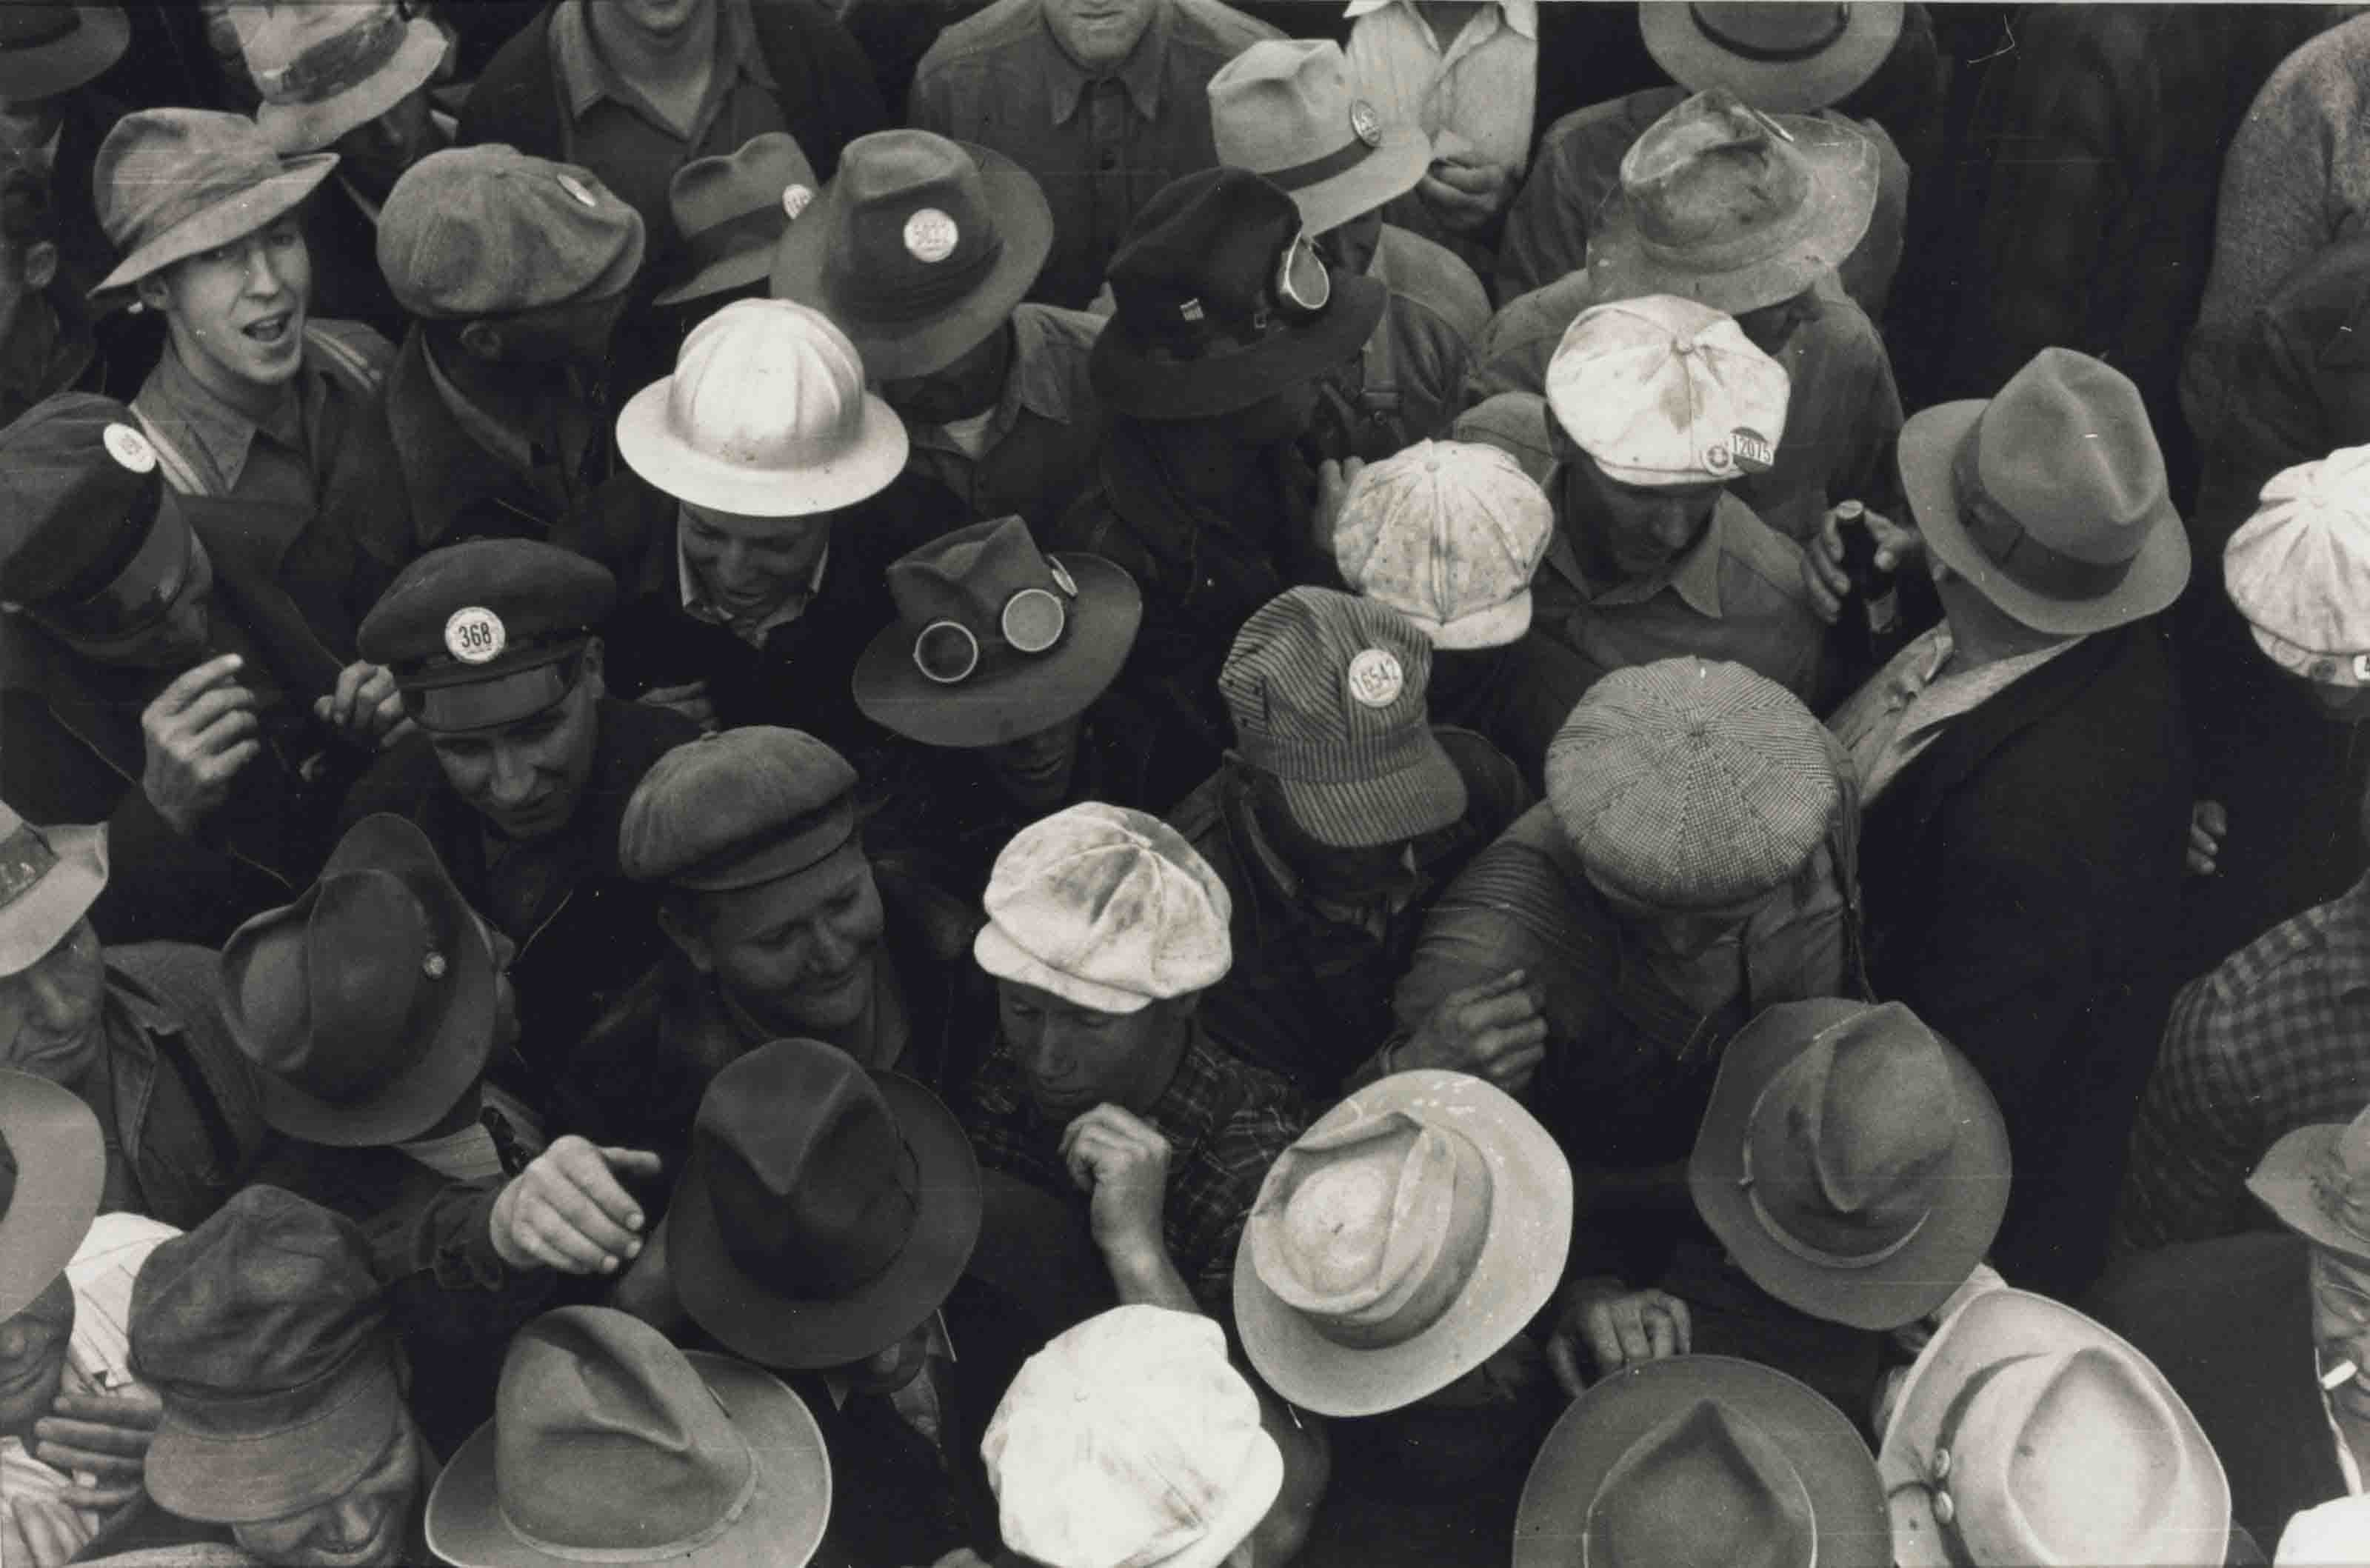 Workmen, Hermiston, Oregon, September, 1941